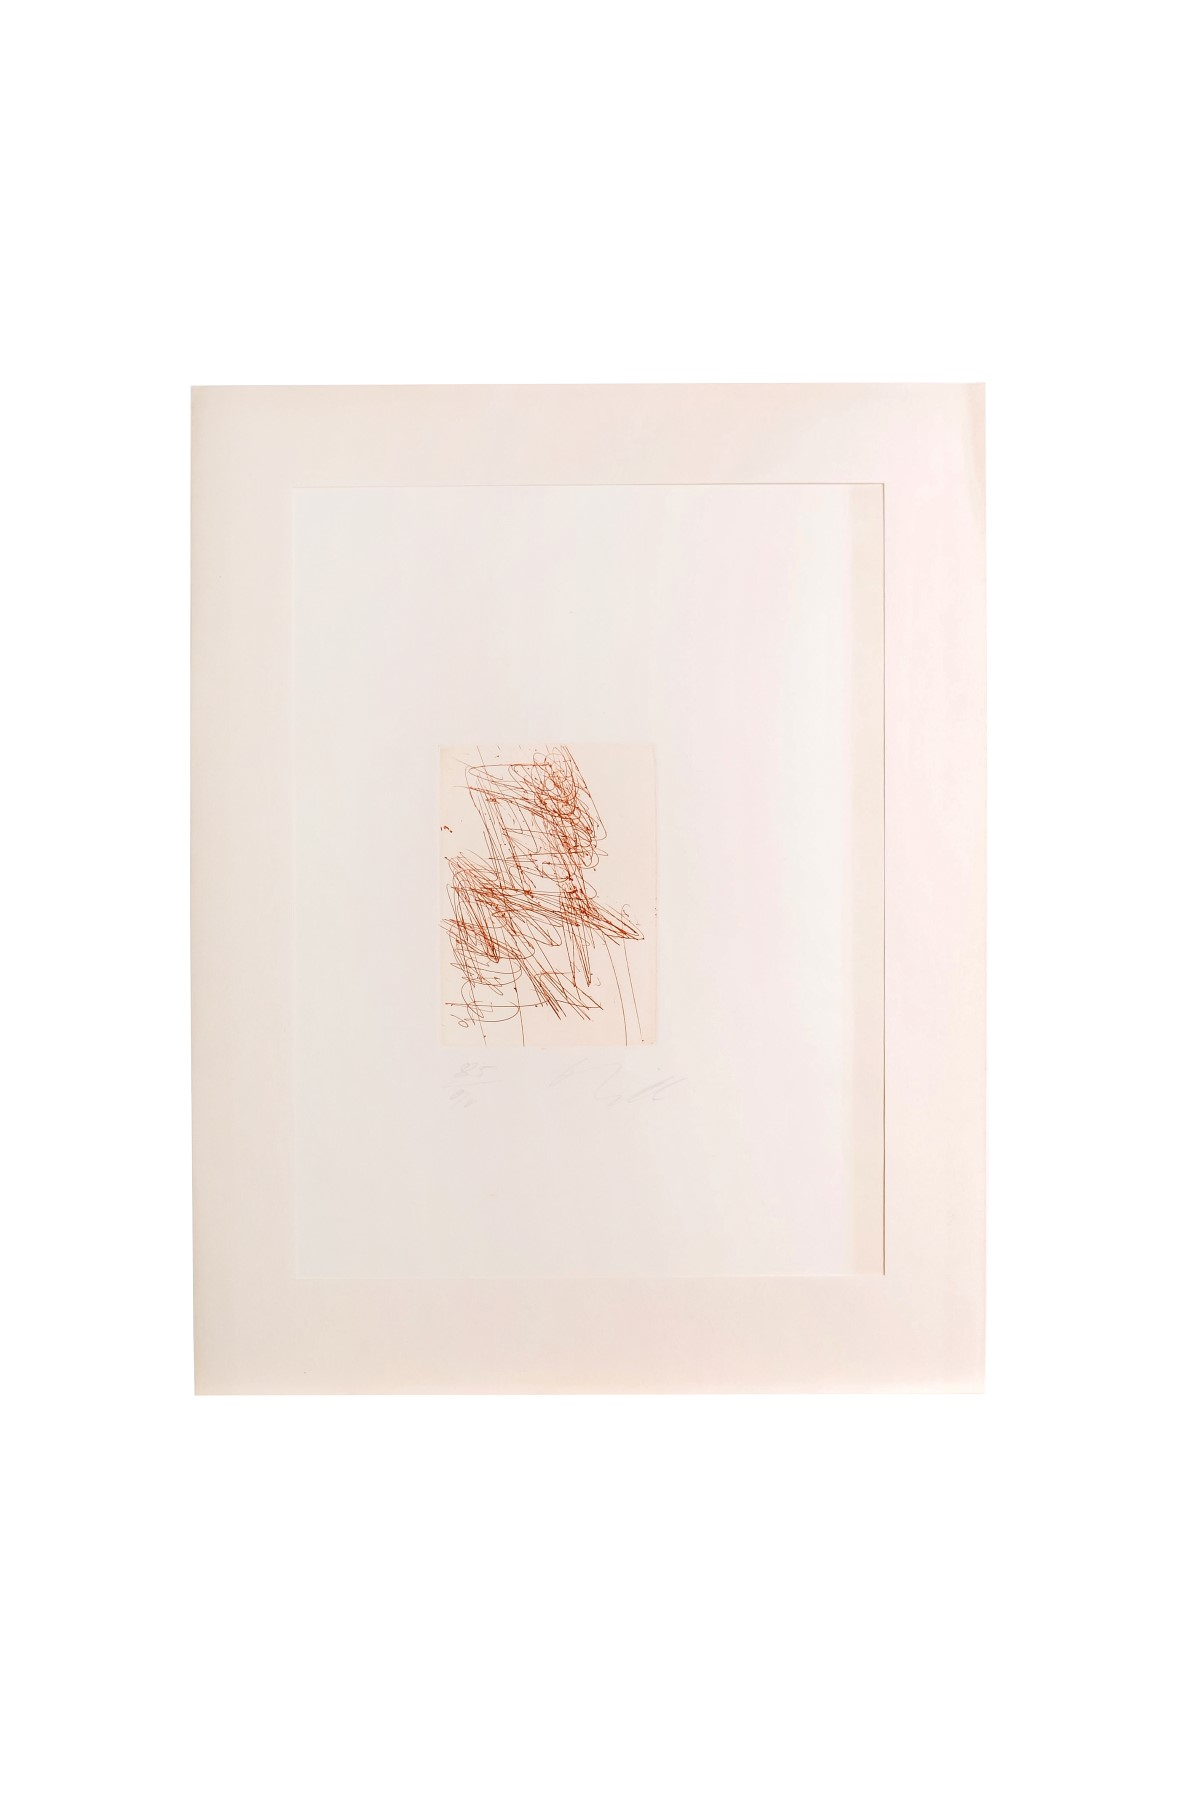 #10 Josef Mikl* (1929 - 2008 Abstract Composition | Josef Mikl* (1929 - 2008), Abstrakte Komposition Image